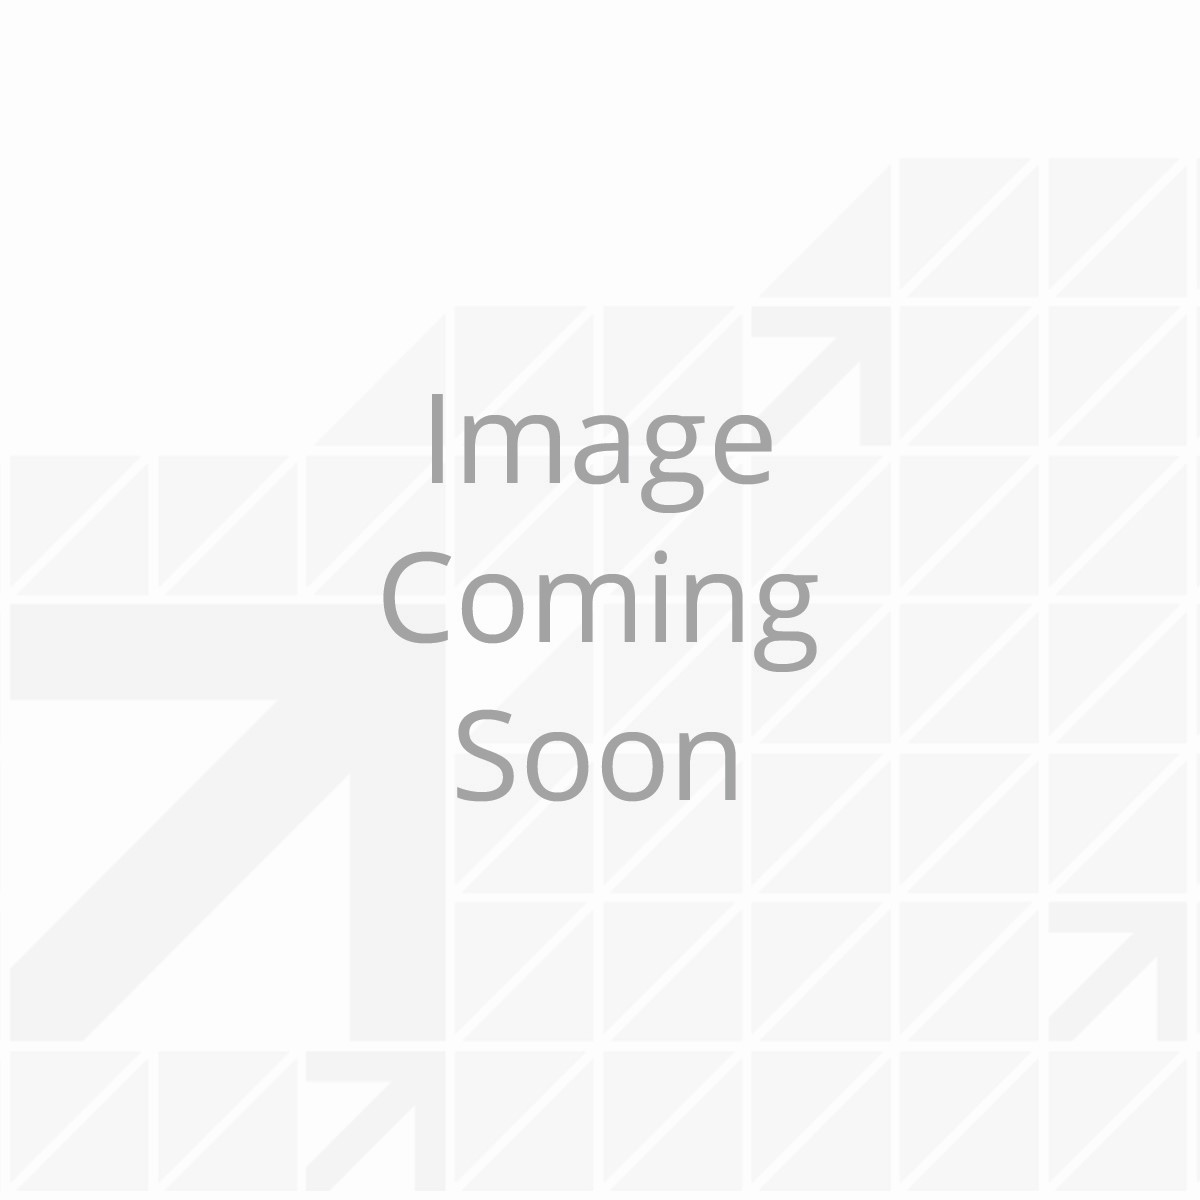 Jack-It® Double Bike Carrier System